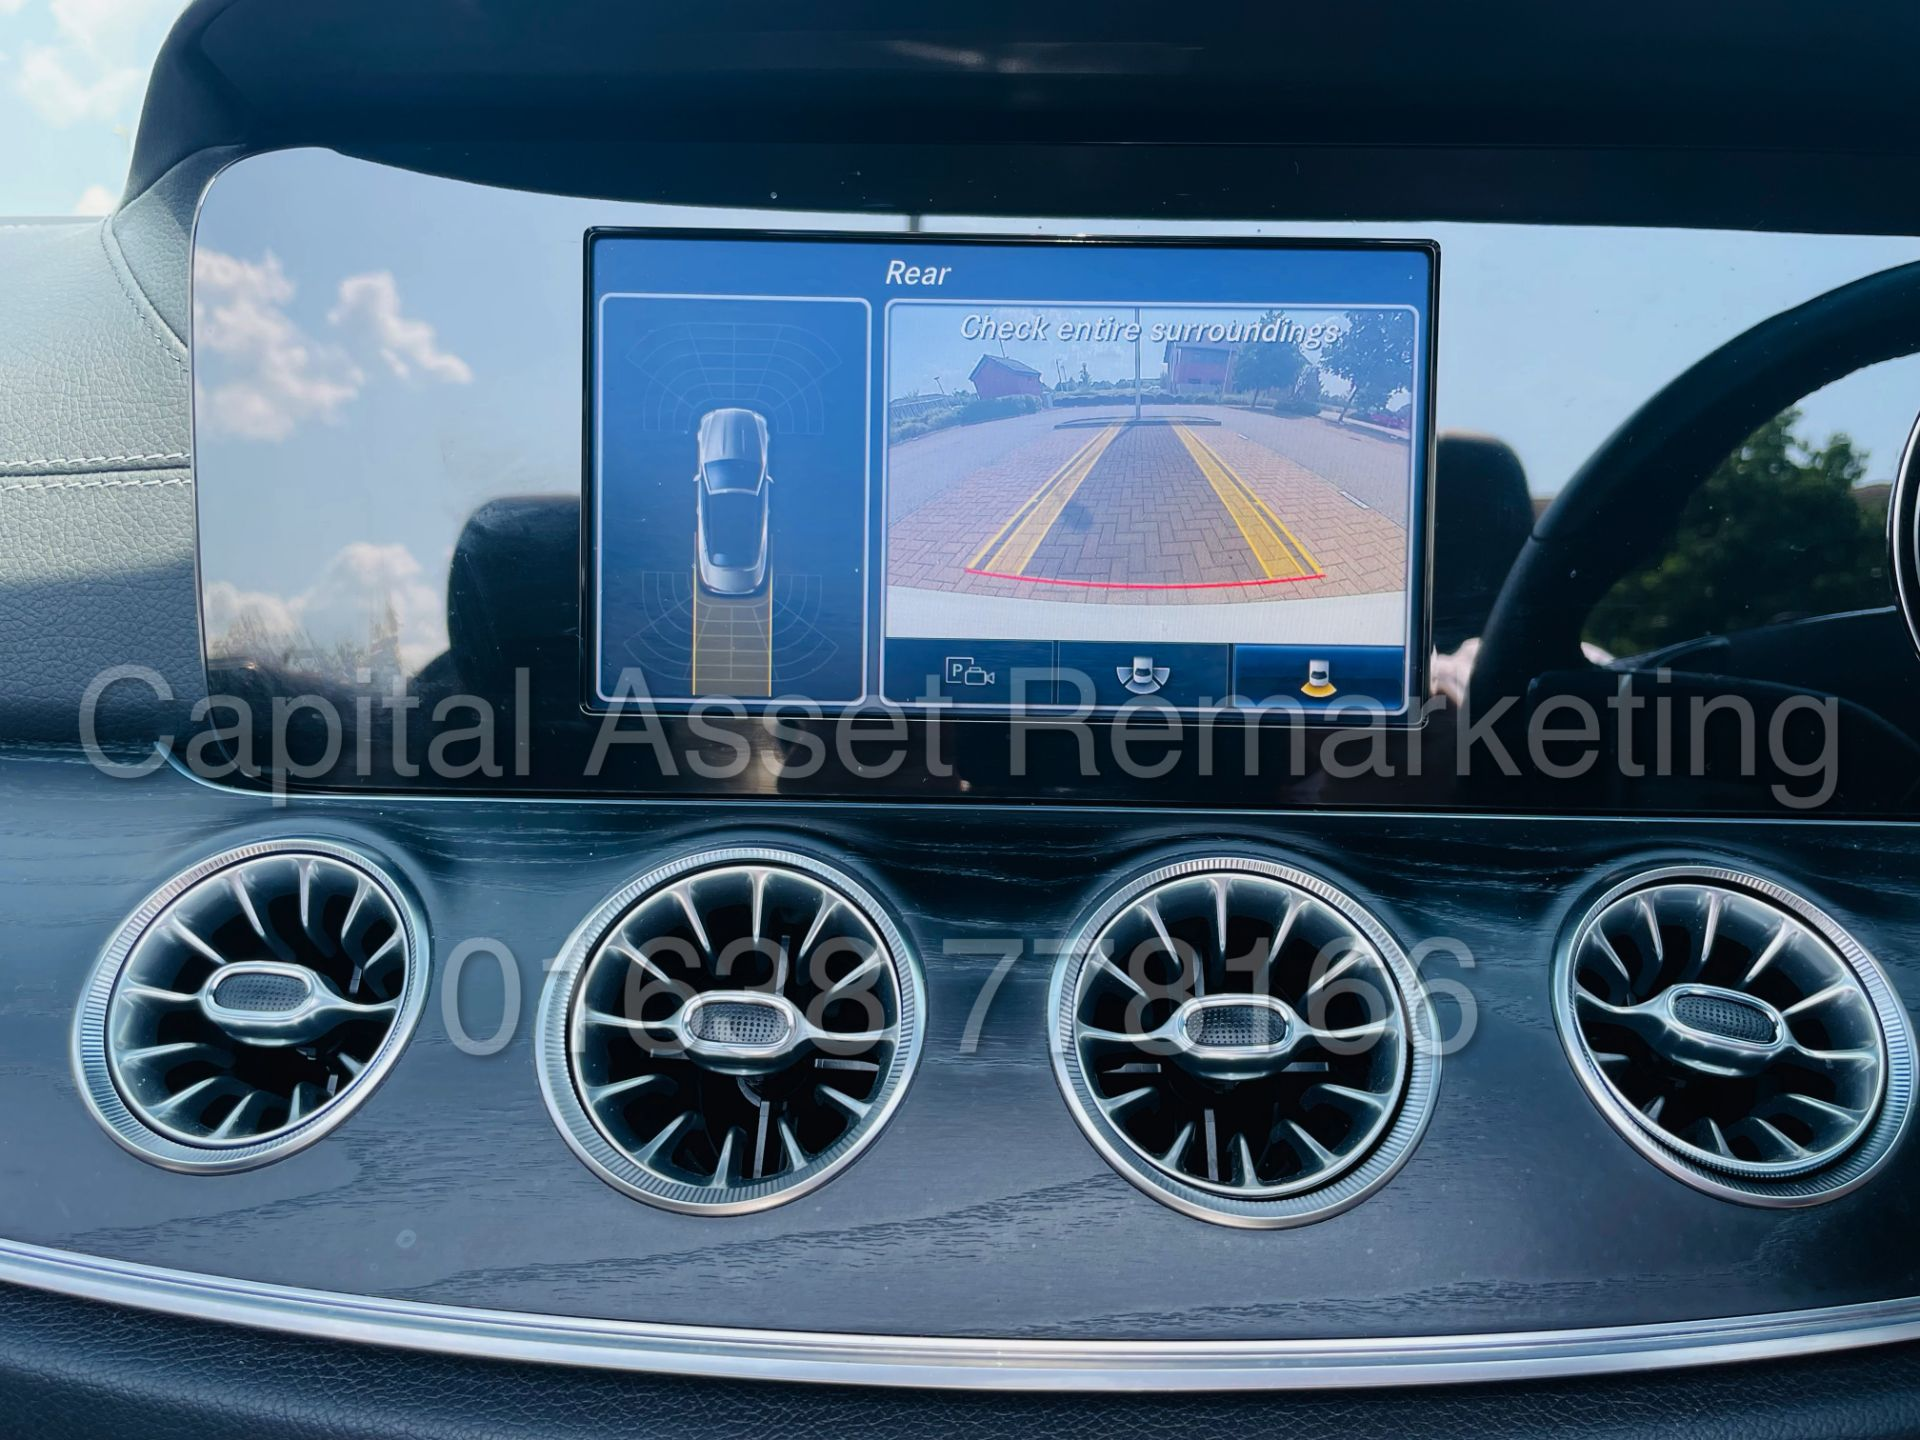 MERCEDES-BENZ E220d *AMG LINE PREMIUM - CABRIOLET* (2018 - EURO 6) '9G AUTO - LEATHER - SAT NAV' - Image 56 of 63